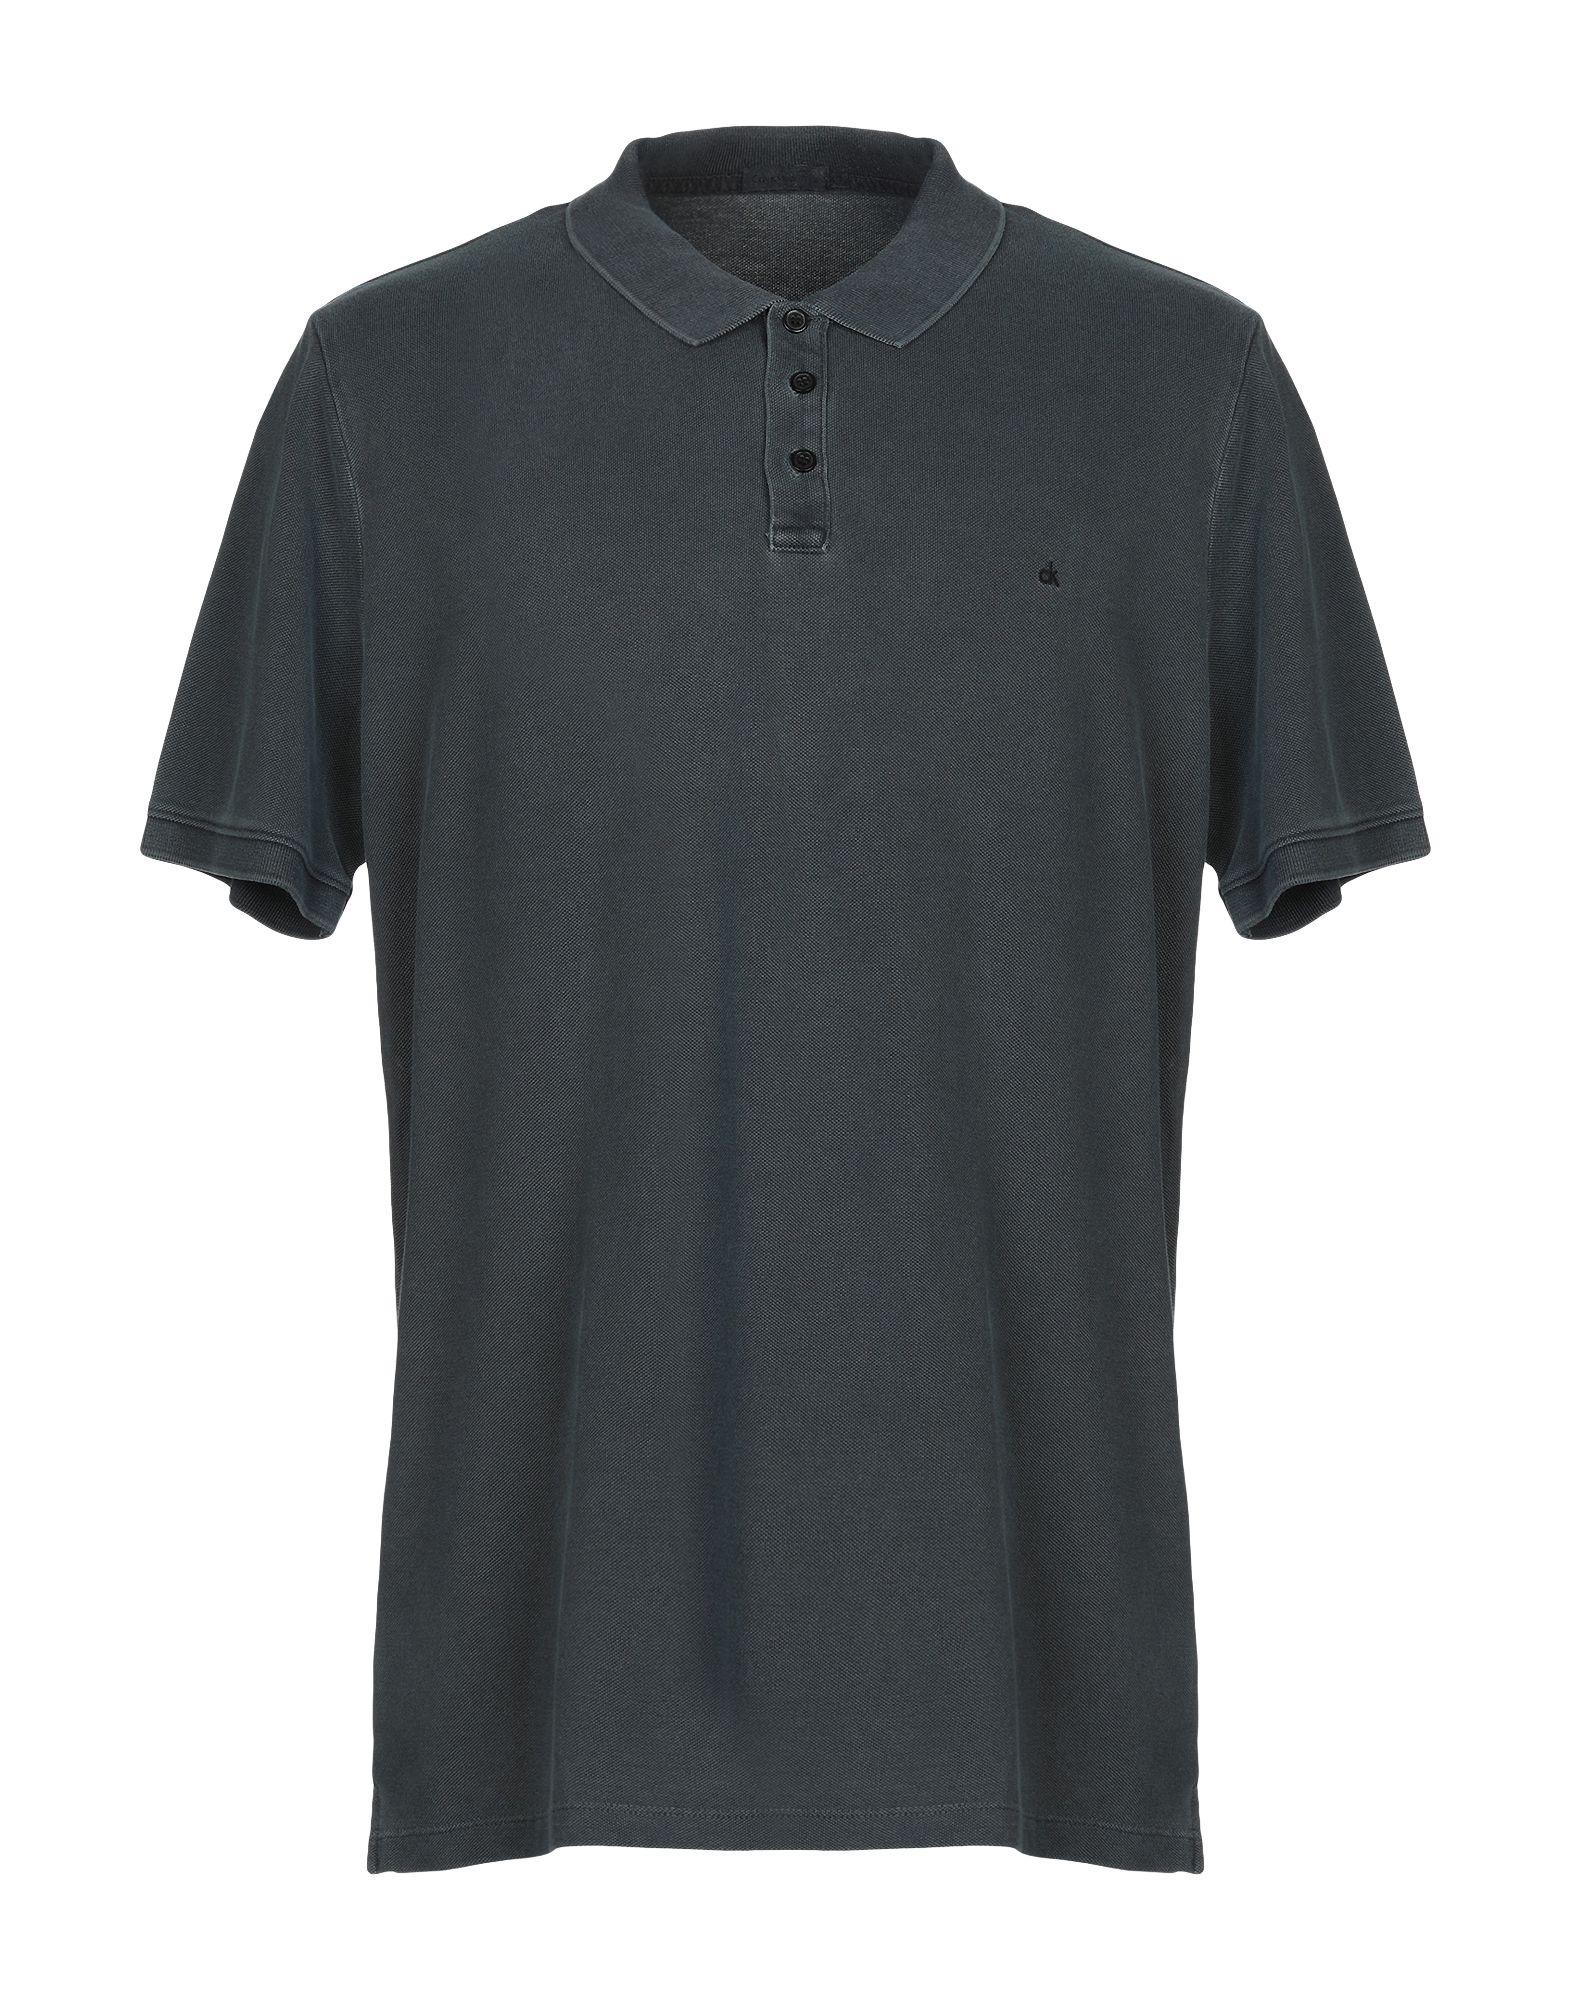 CALVIN KLEIN JEANS Поло поло мужское calvin klein jeans цвет черный j30j306932 0990 размер xxl 52 54